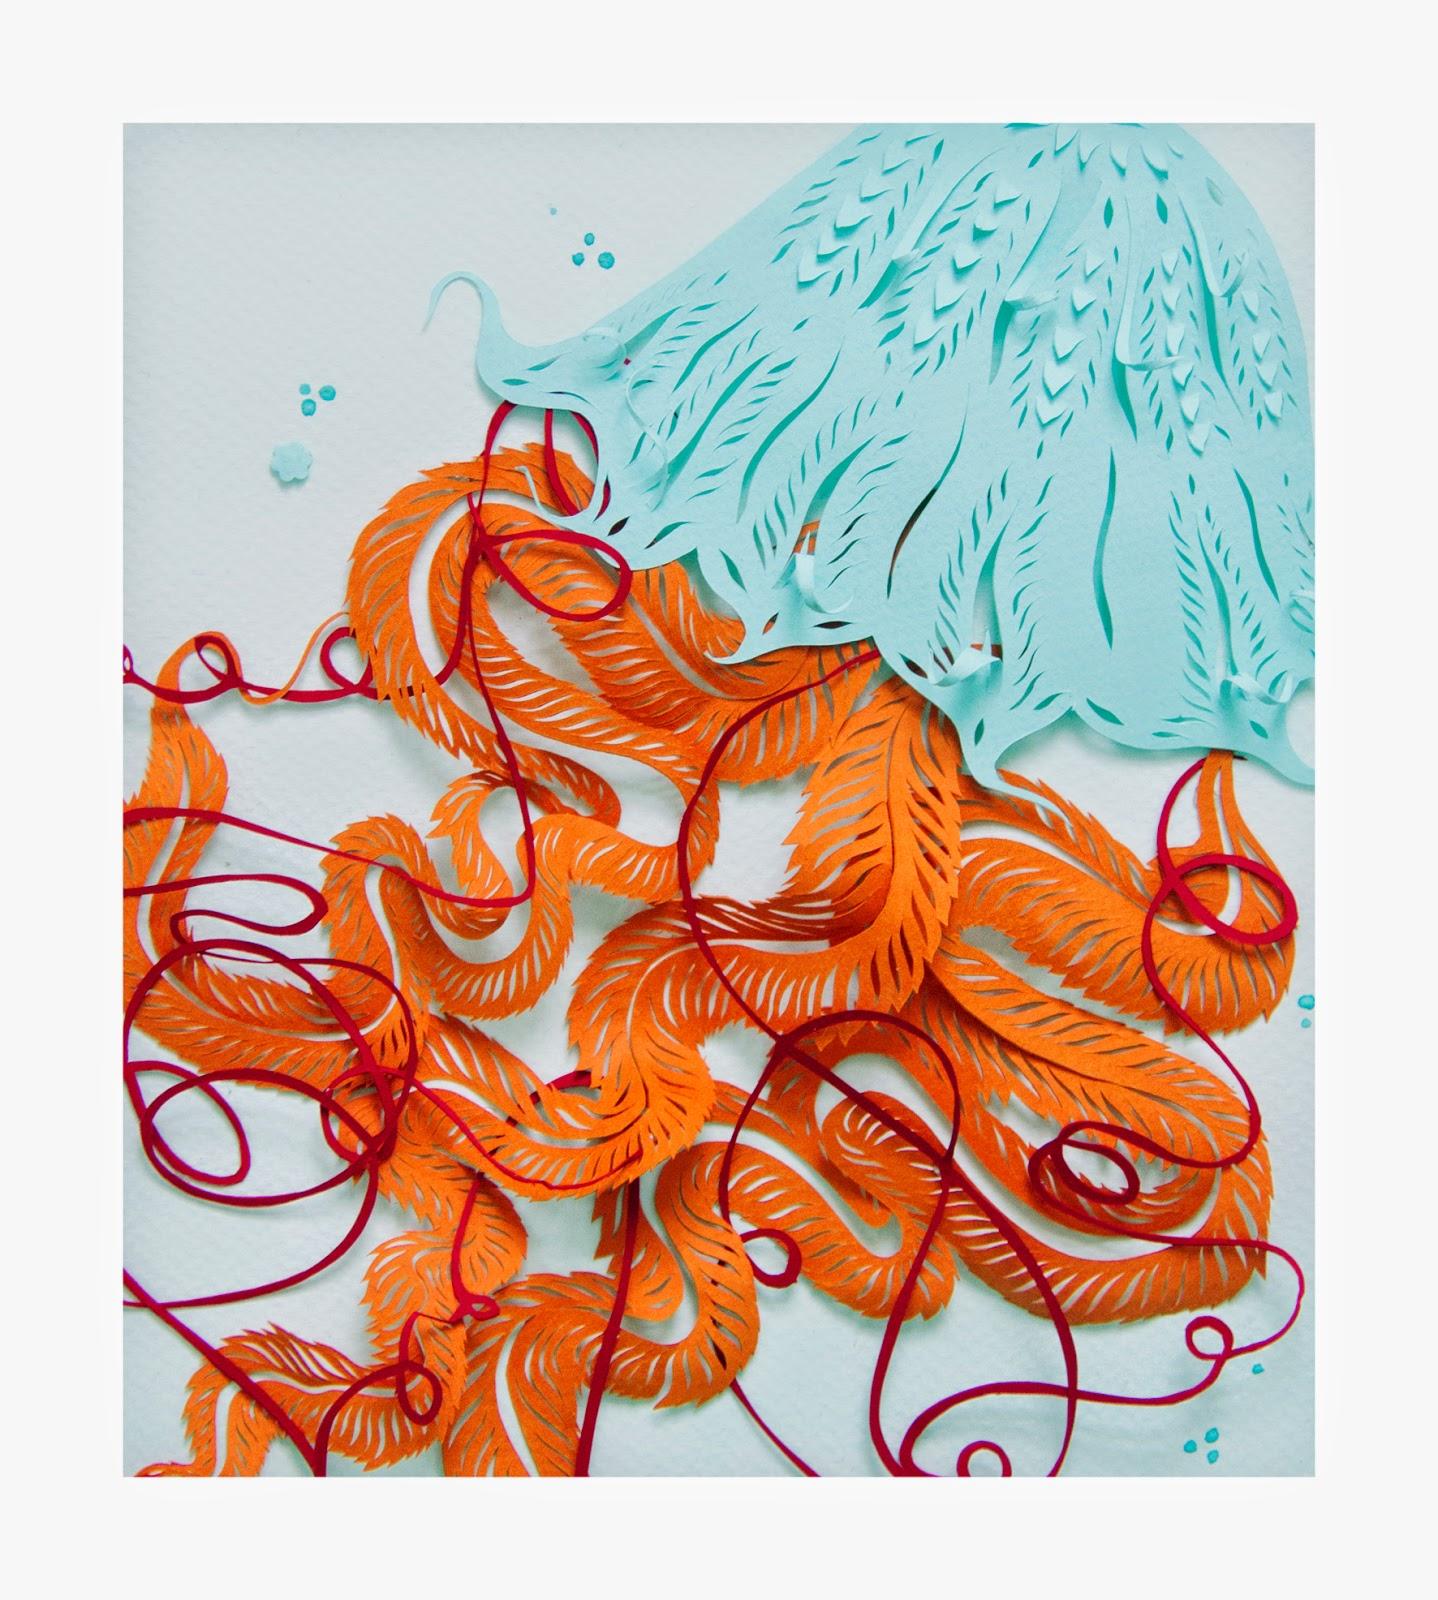 Jellyfish-HR2.jpg